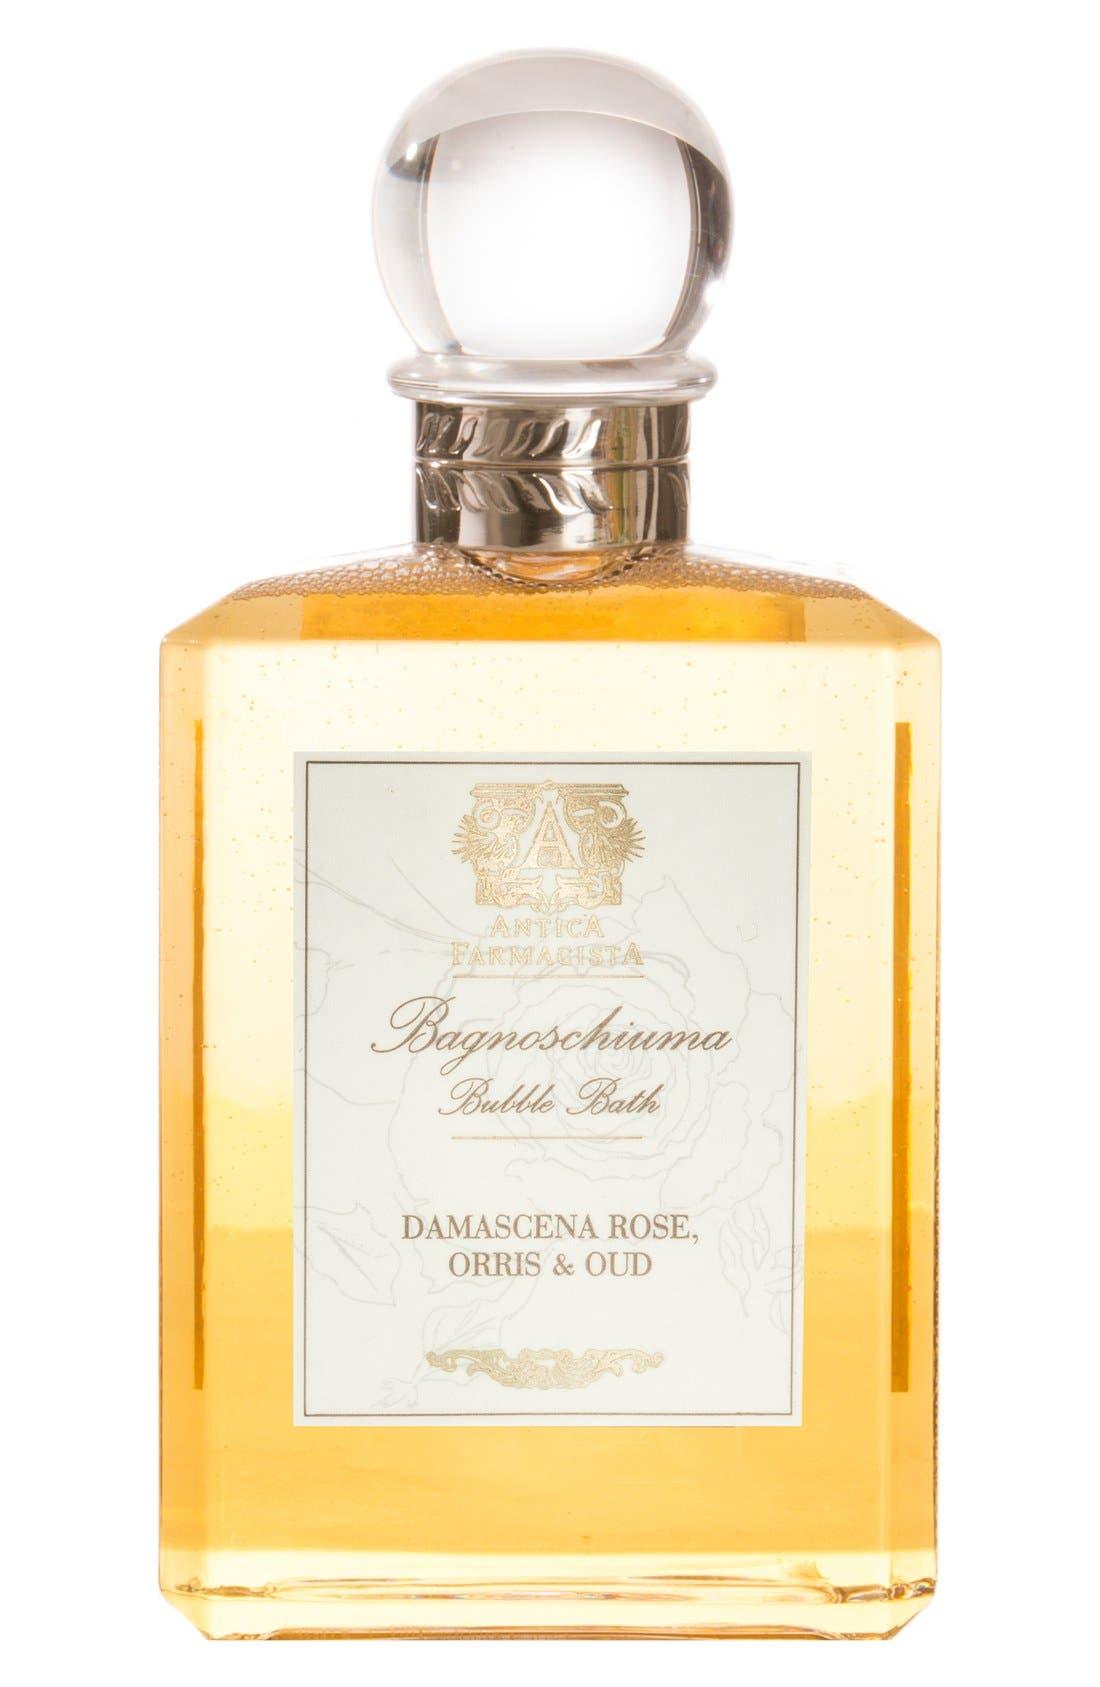 Antica Farmacista 'Damascena Rose, Orris & Oud' Bubble Bath